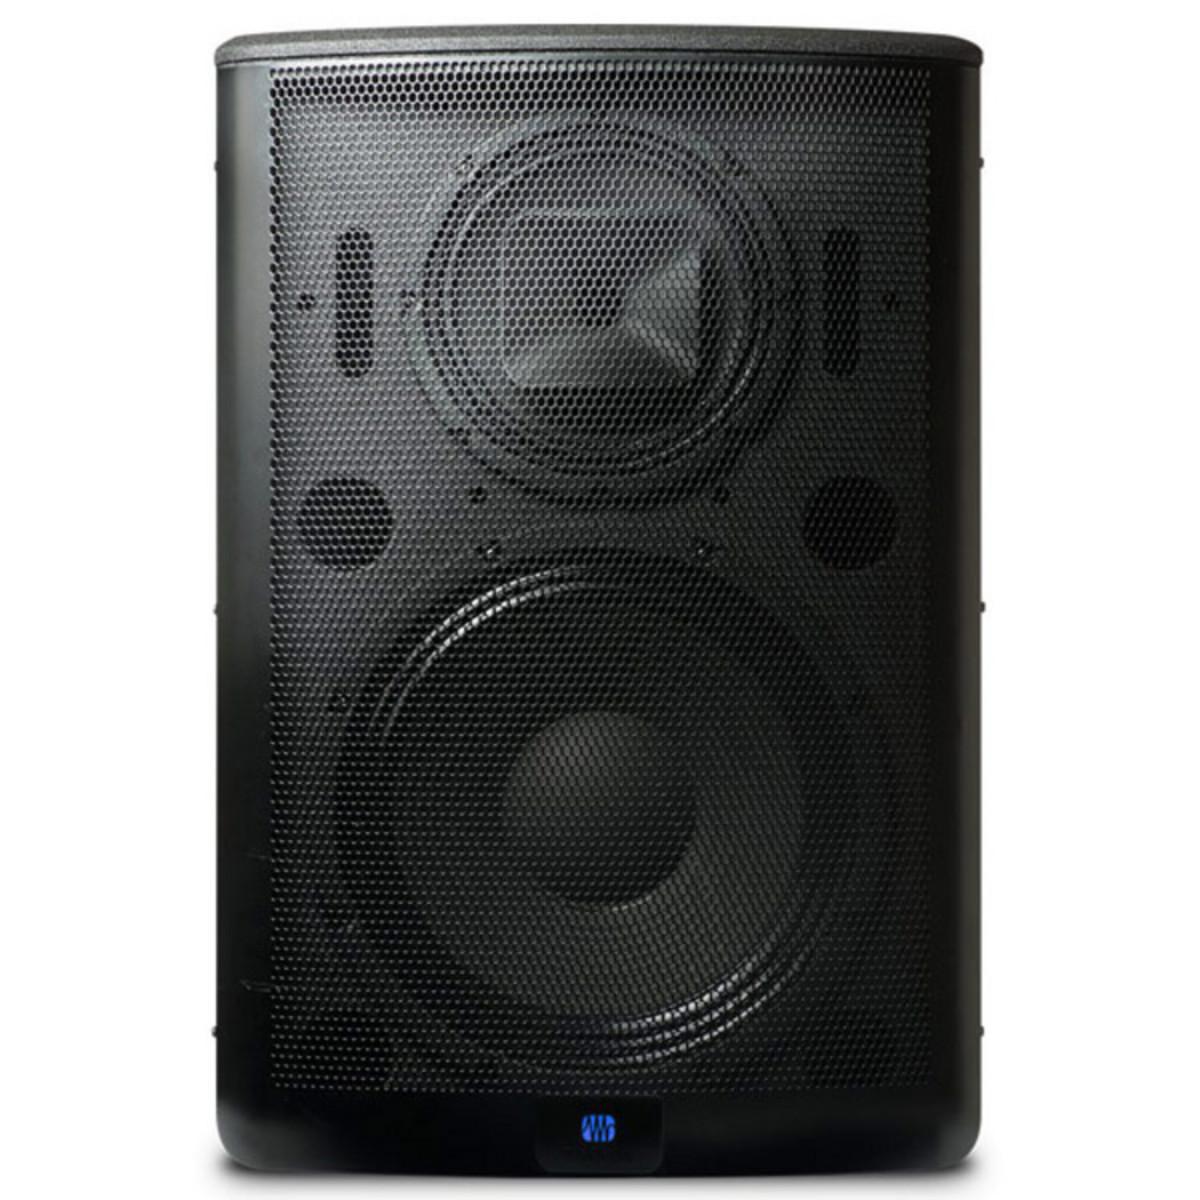 SONDERANGEBOT Presonus Main-312AI Aktive PA-Lautsprecher bei Gear4music